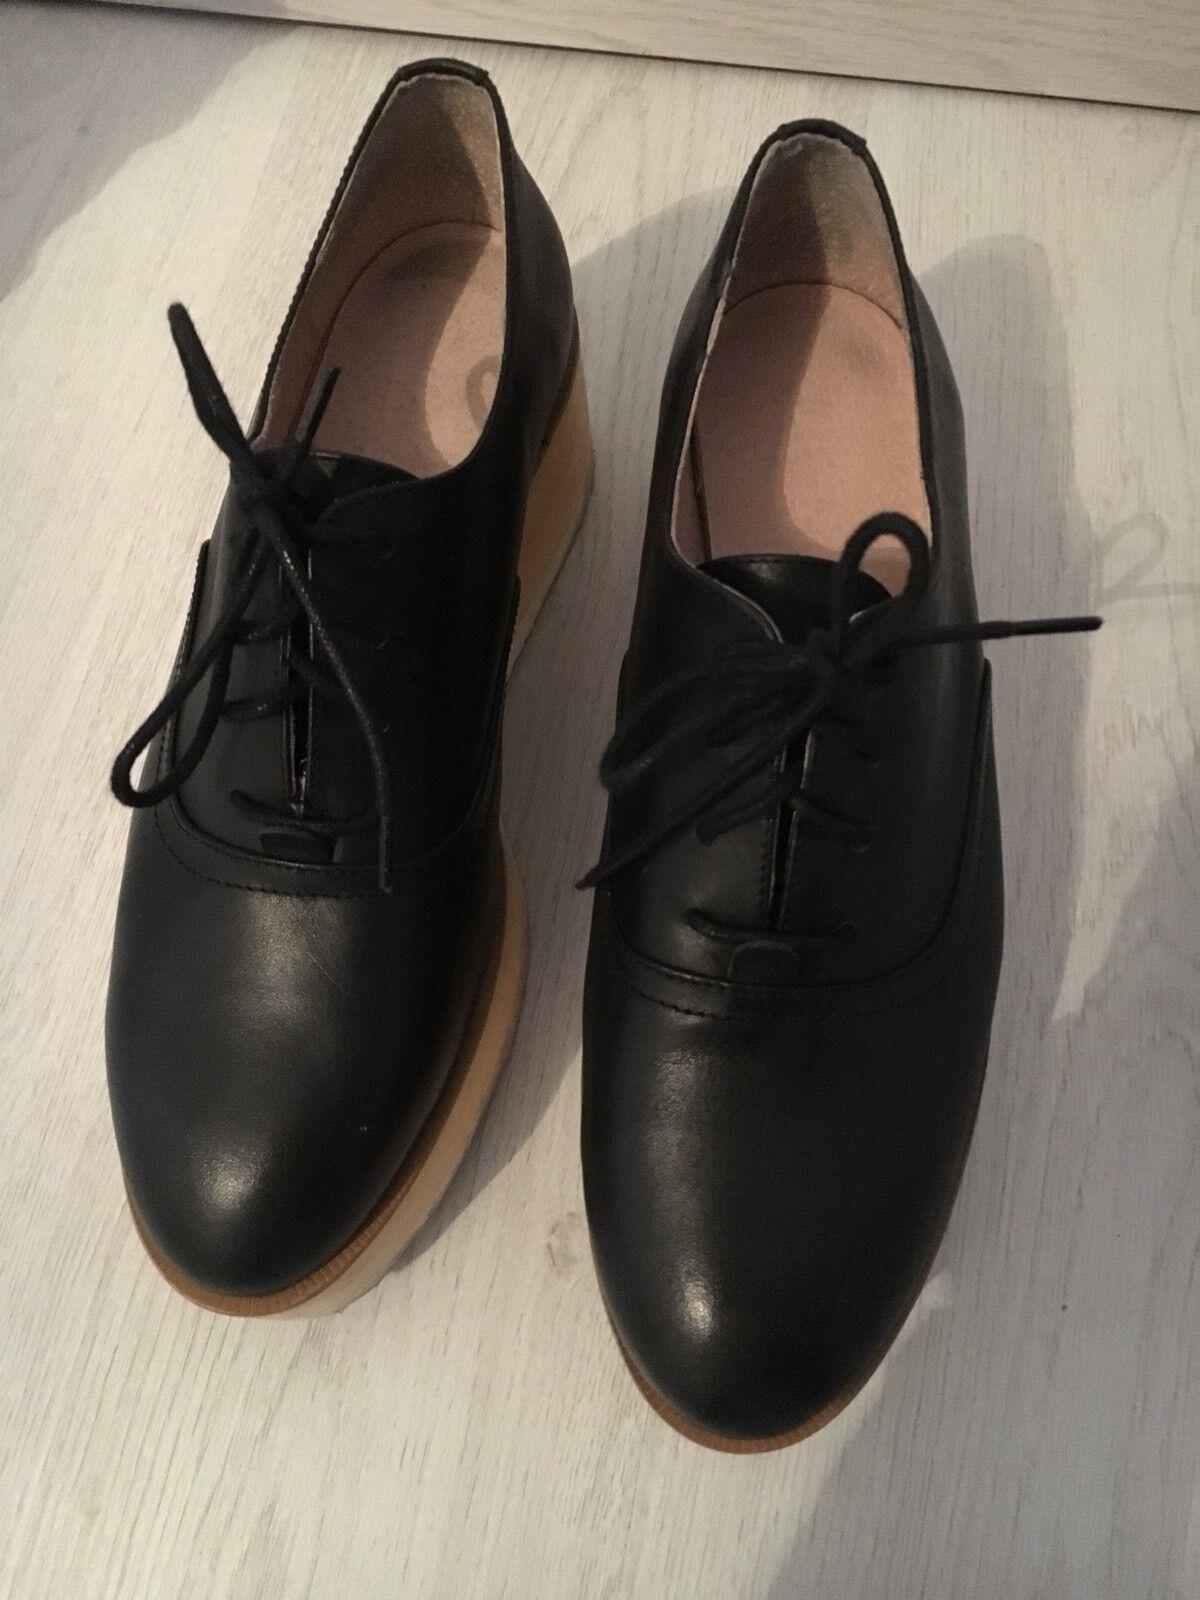 Zign Schuhe Plateau Gr 39 Tend Style Blogger Leder Sold Out NP